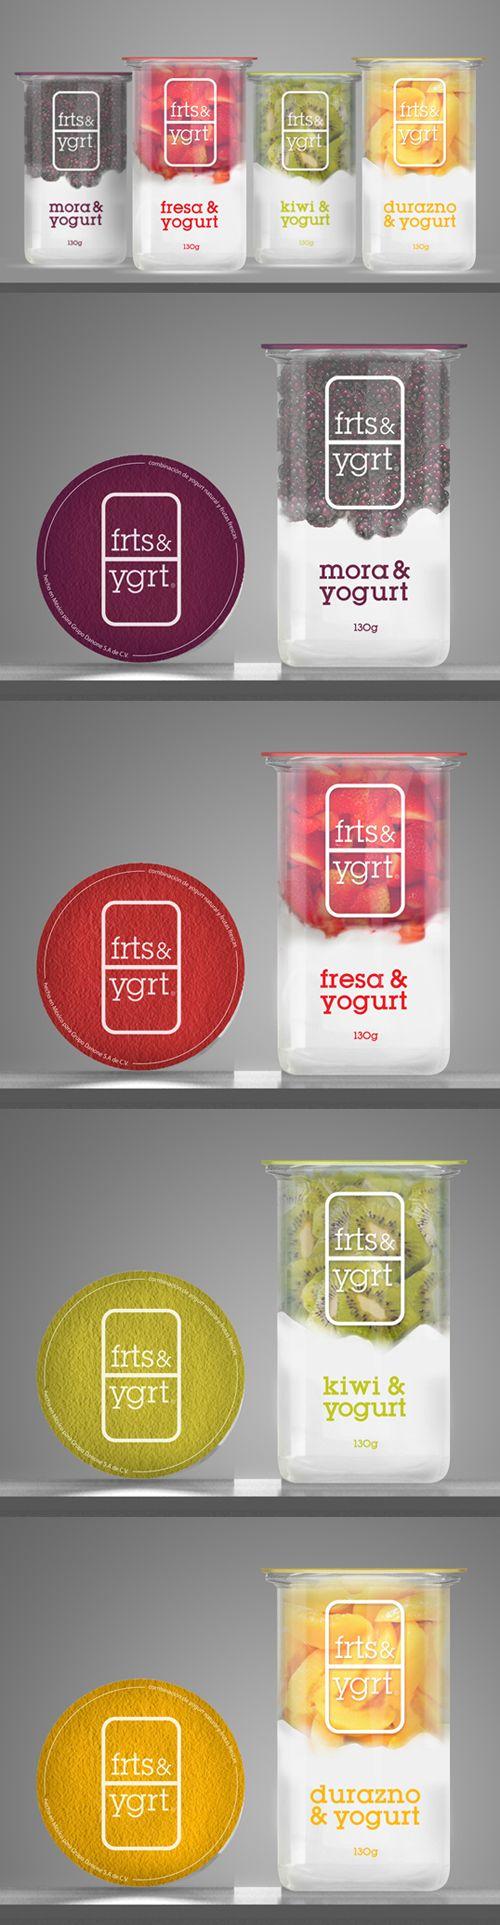 Clear show off the fruit and yogurt inside   Fruit Yogurt Designed by Mika Kañive.